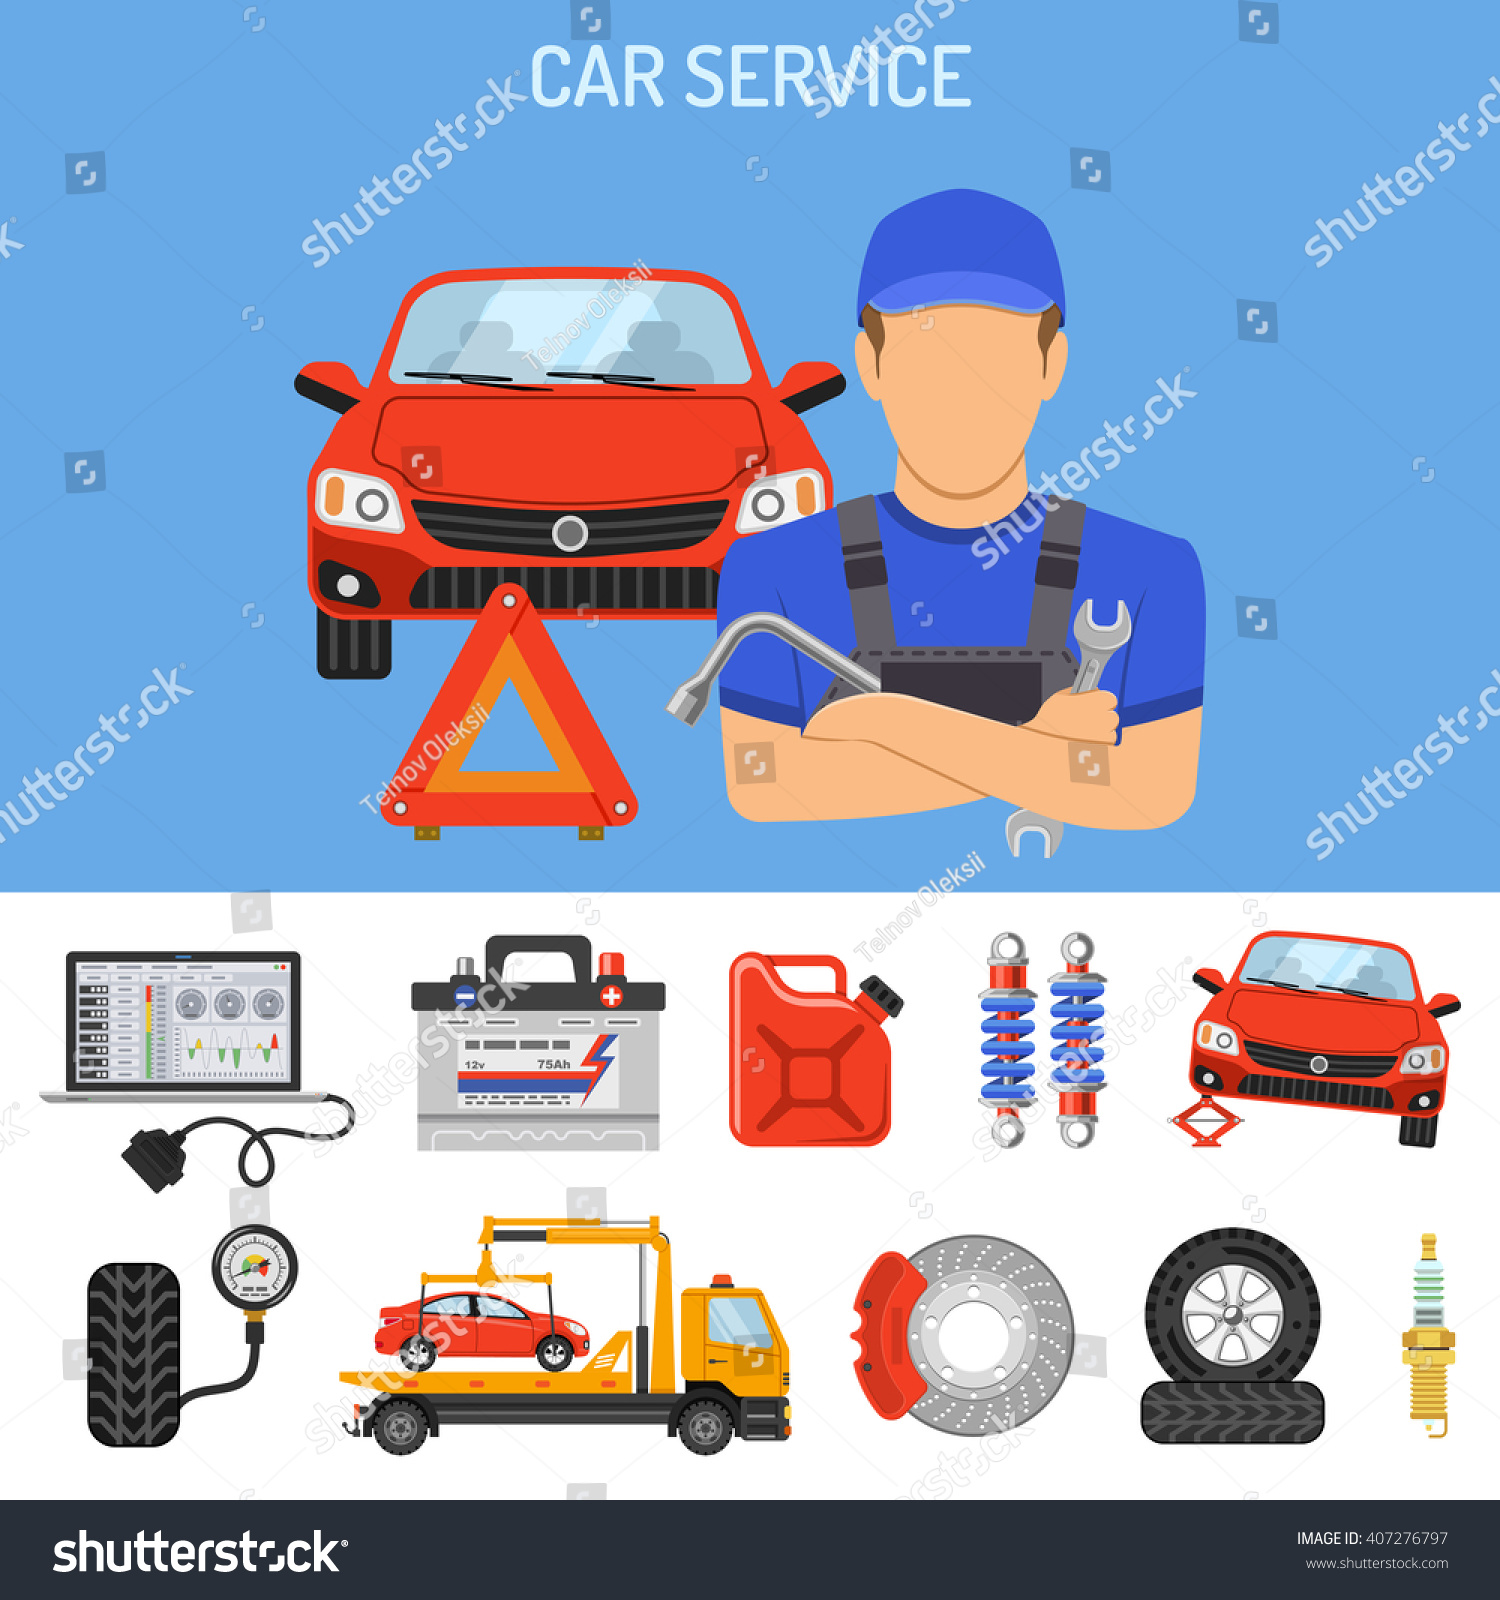 car service concept flat icons poster stock-vektorgrafik (lizenzfrei